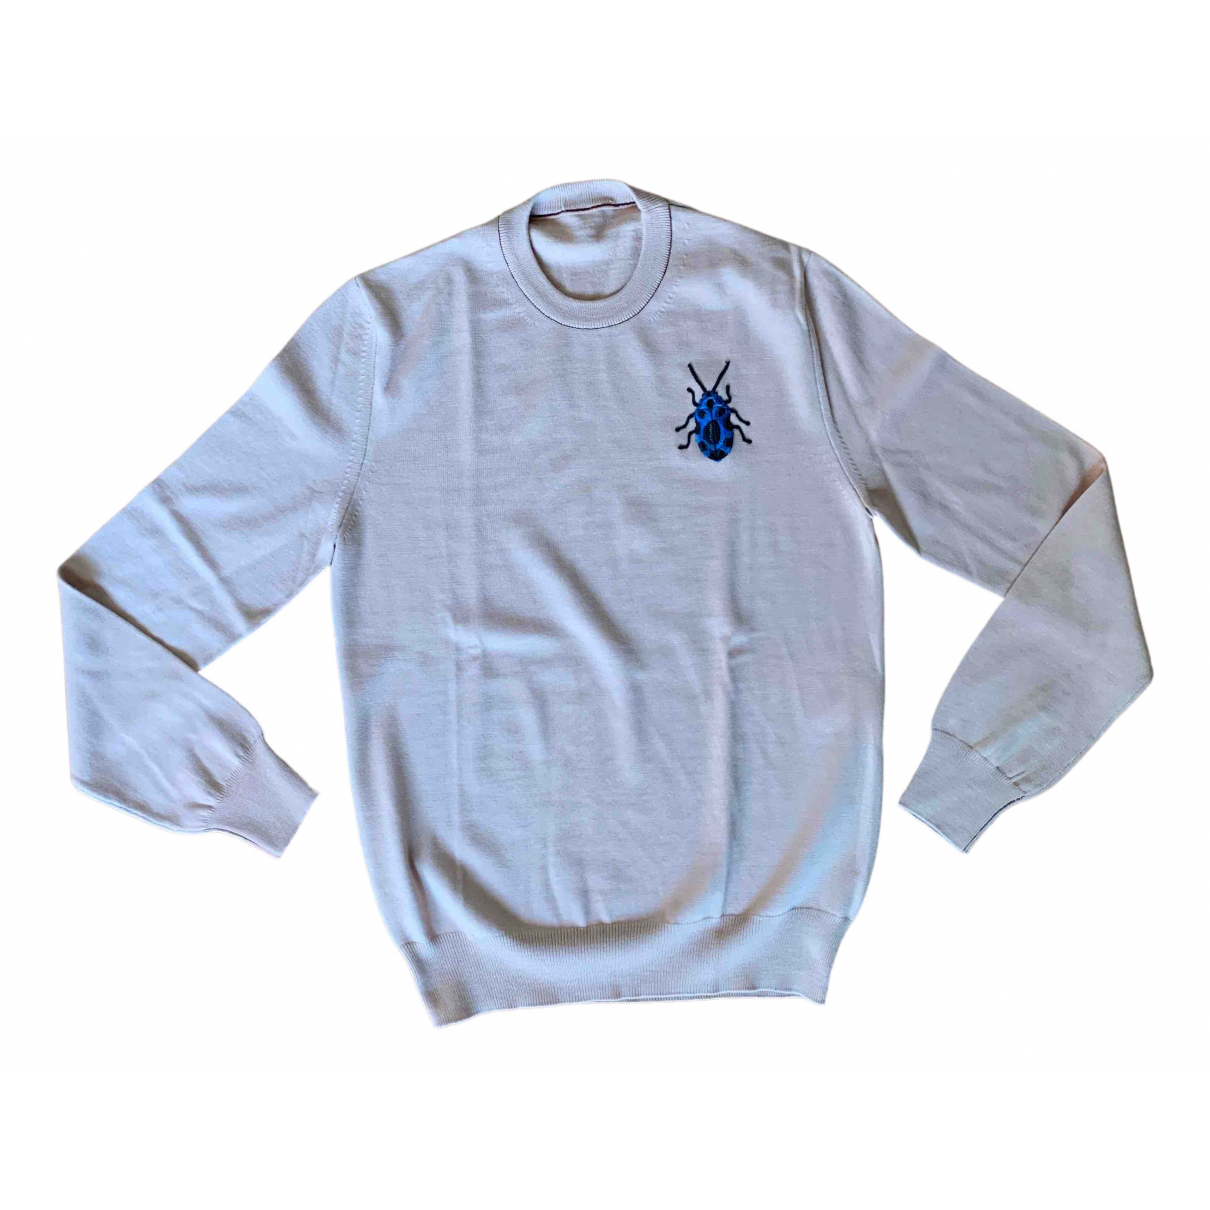 Alexander Mcqueen - Pulls.Gilets.Sweats   pour homme en laine - beige